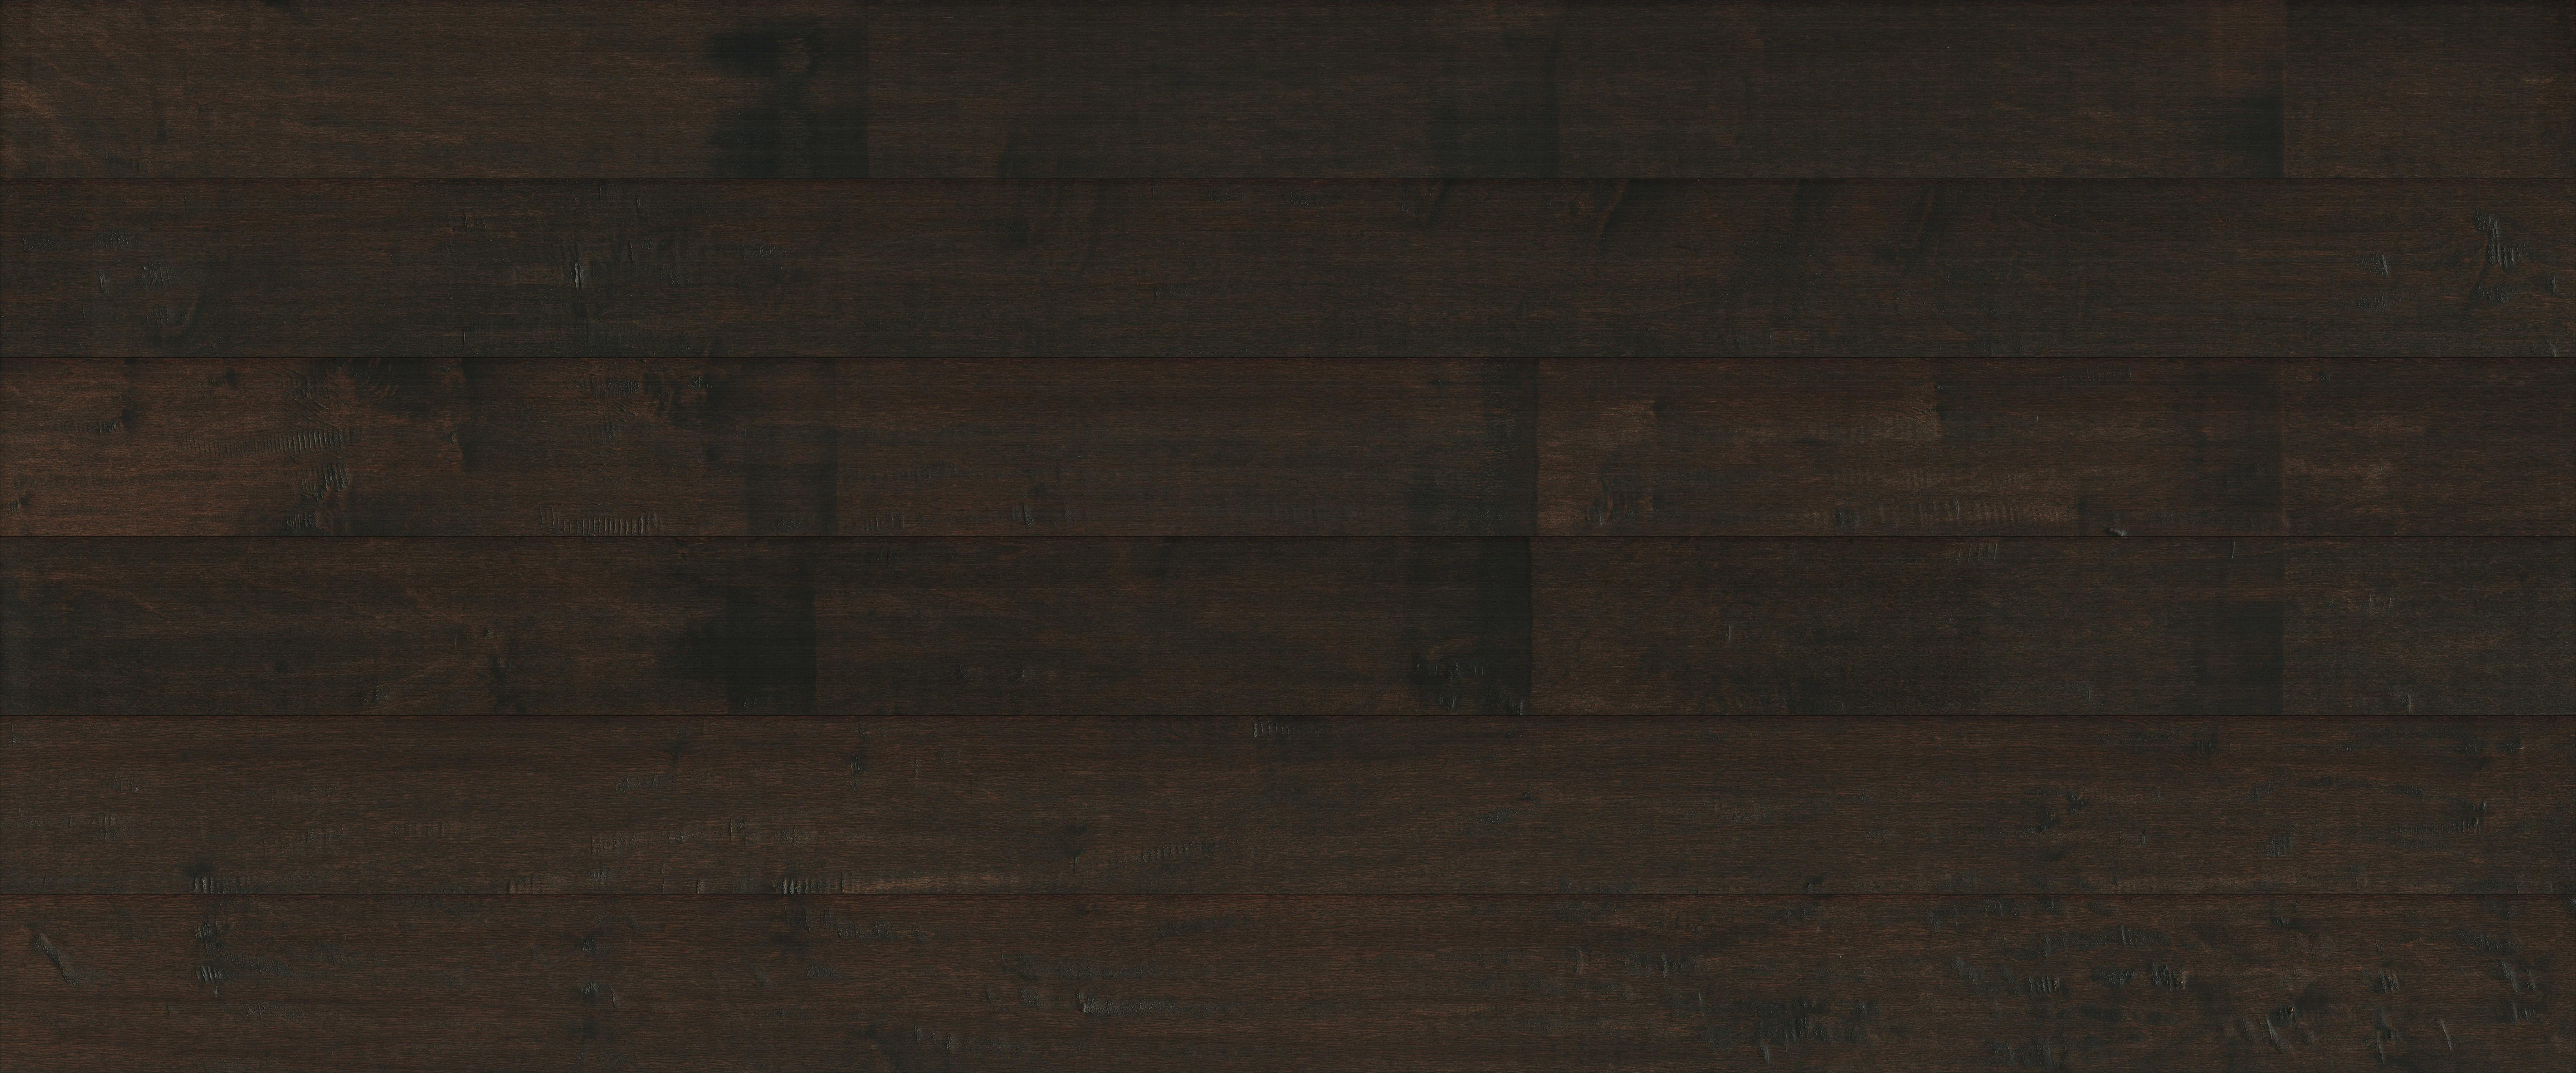 16 Trendy Bruce 3 8 Hardwood Flooring 2021 free download bruce 3 8 hardwood flooring of mullican san marco sculpted maple dark mocha 5 engineered hardwood throughout mullican san marco sculpted maple dark mocha 5 engineered hardwood flooring